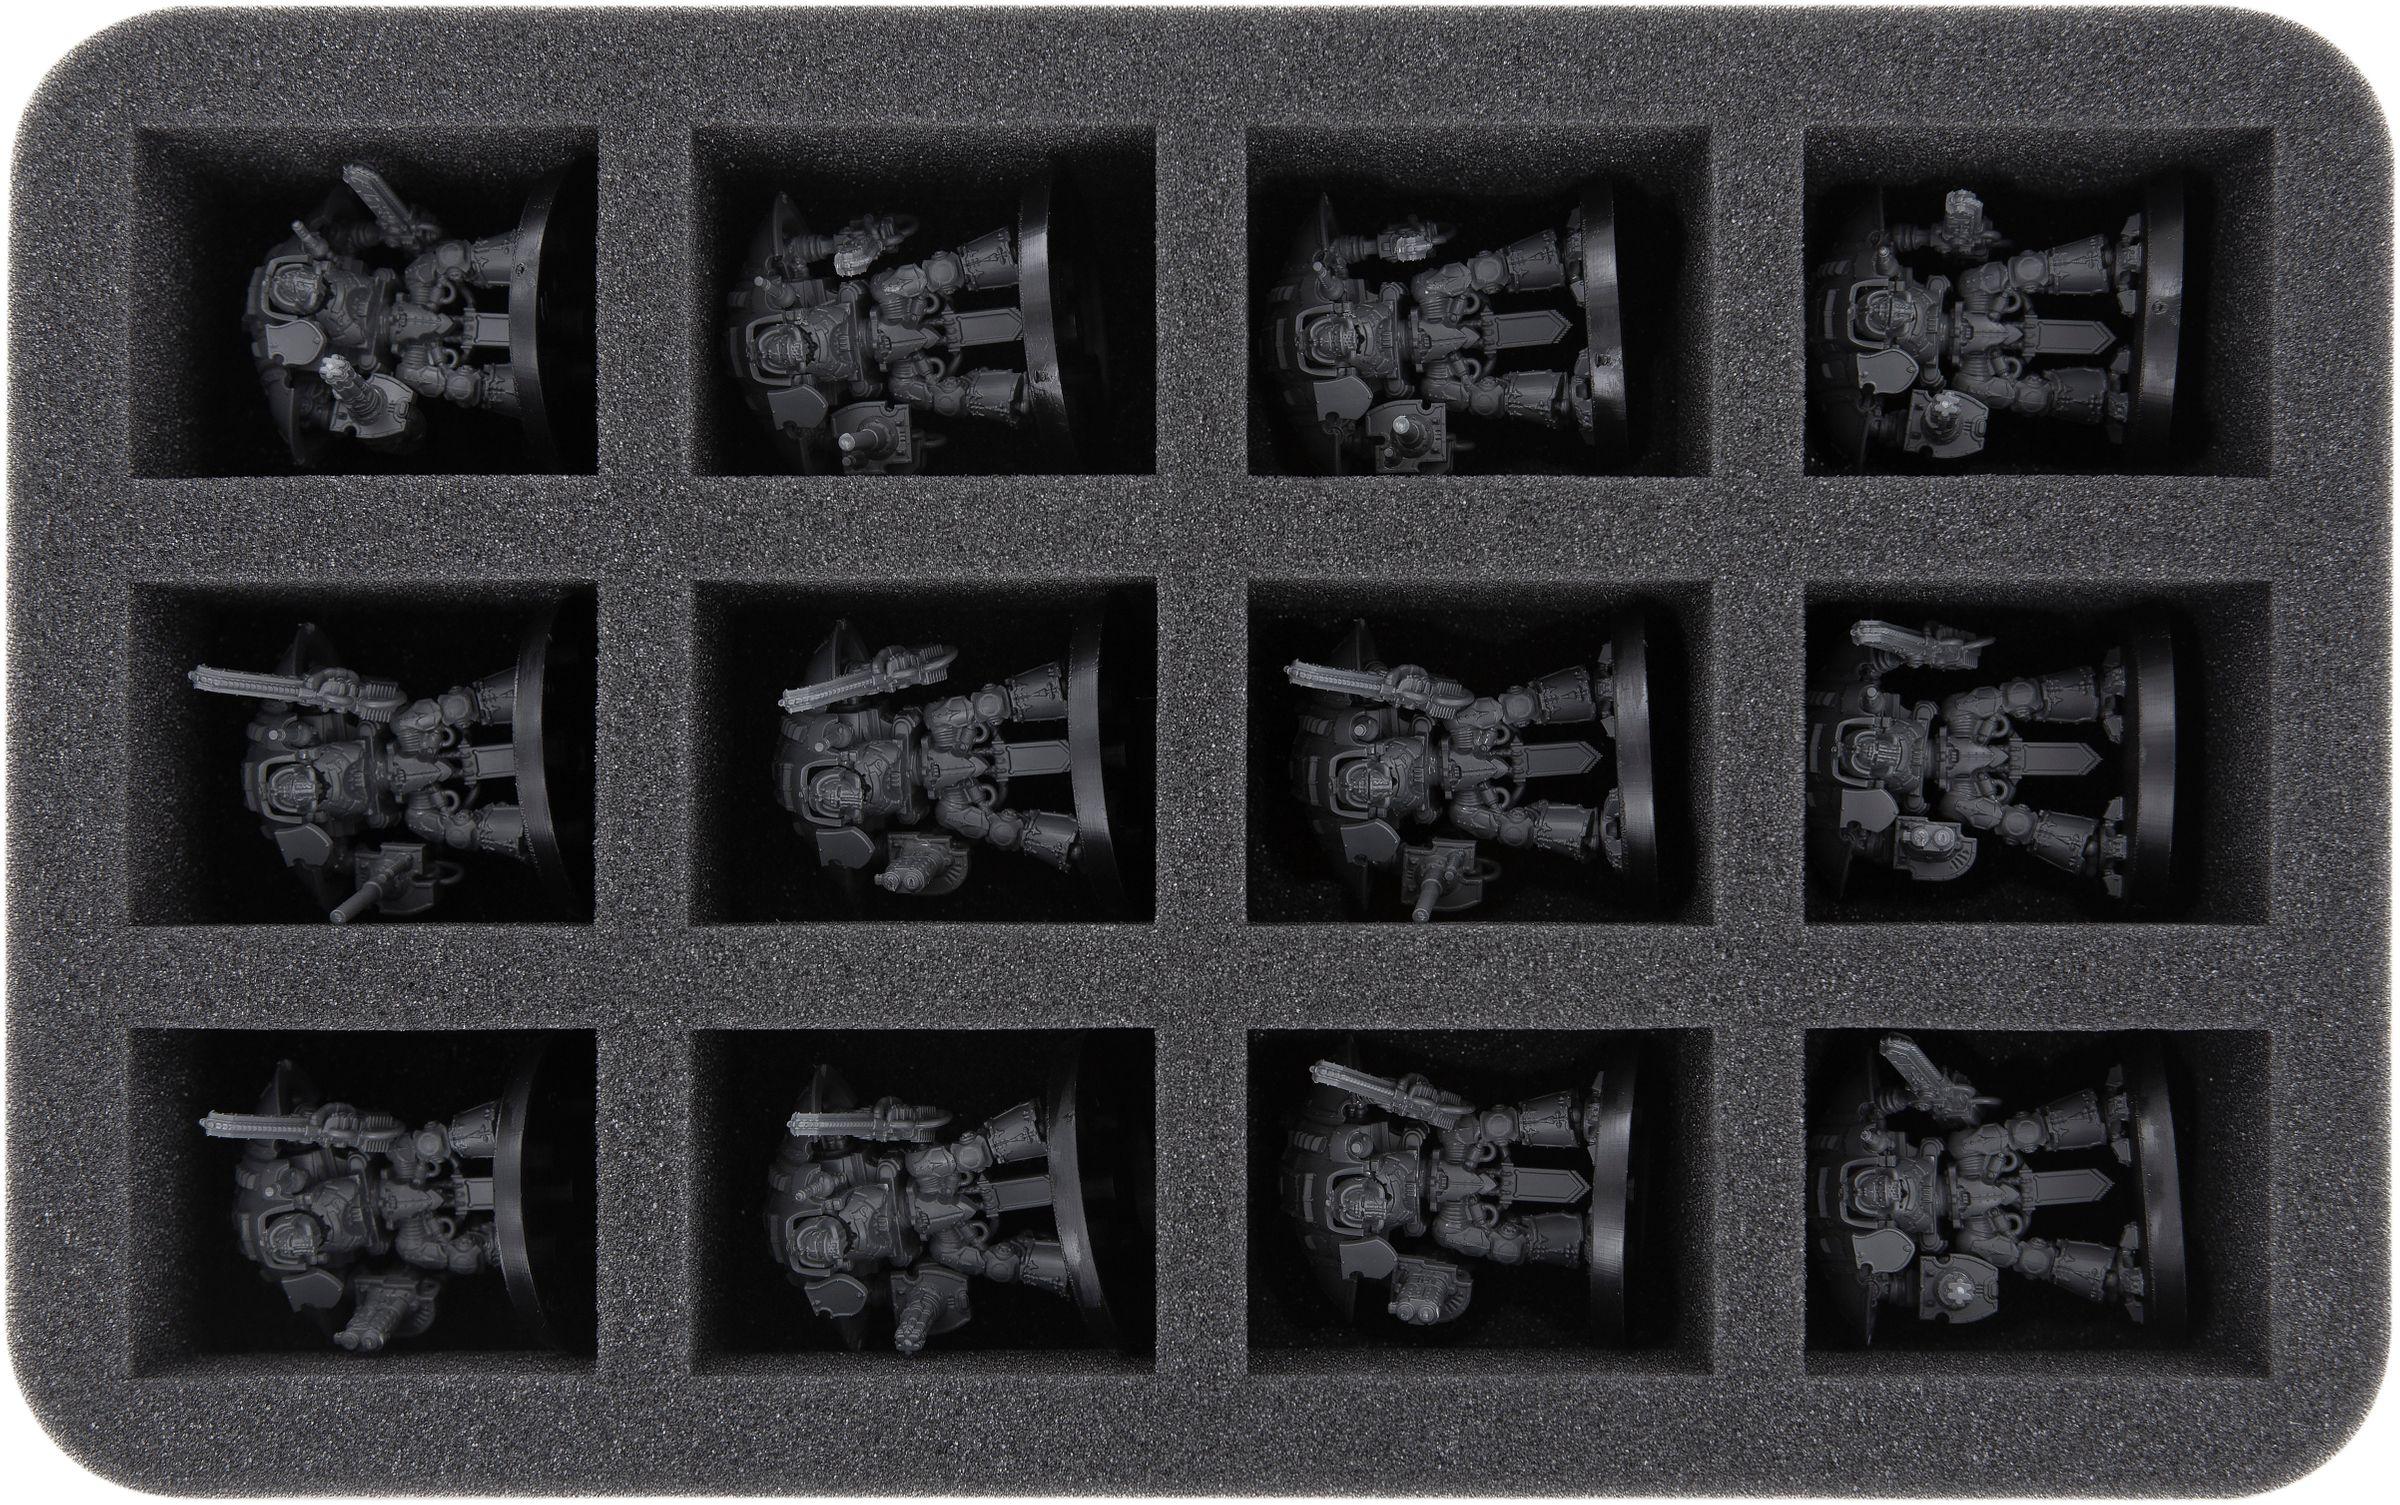 HS050WH29 Half-Size foam tray for Adeptus Titanicus: Imperial Knights |  Feldherr Worldwide